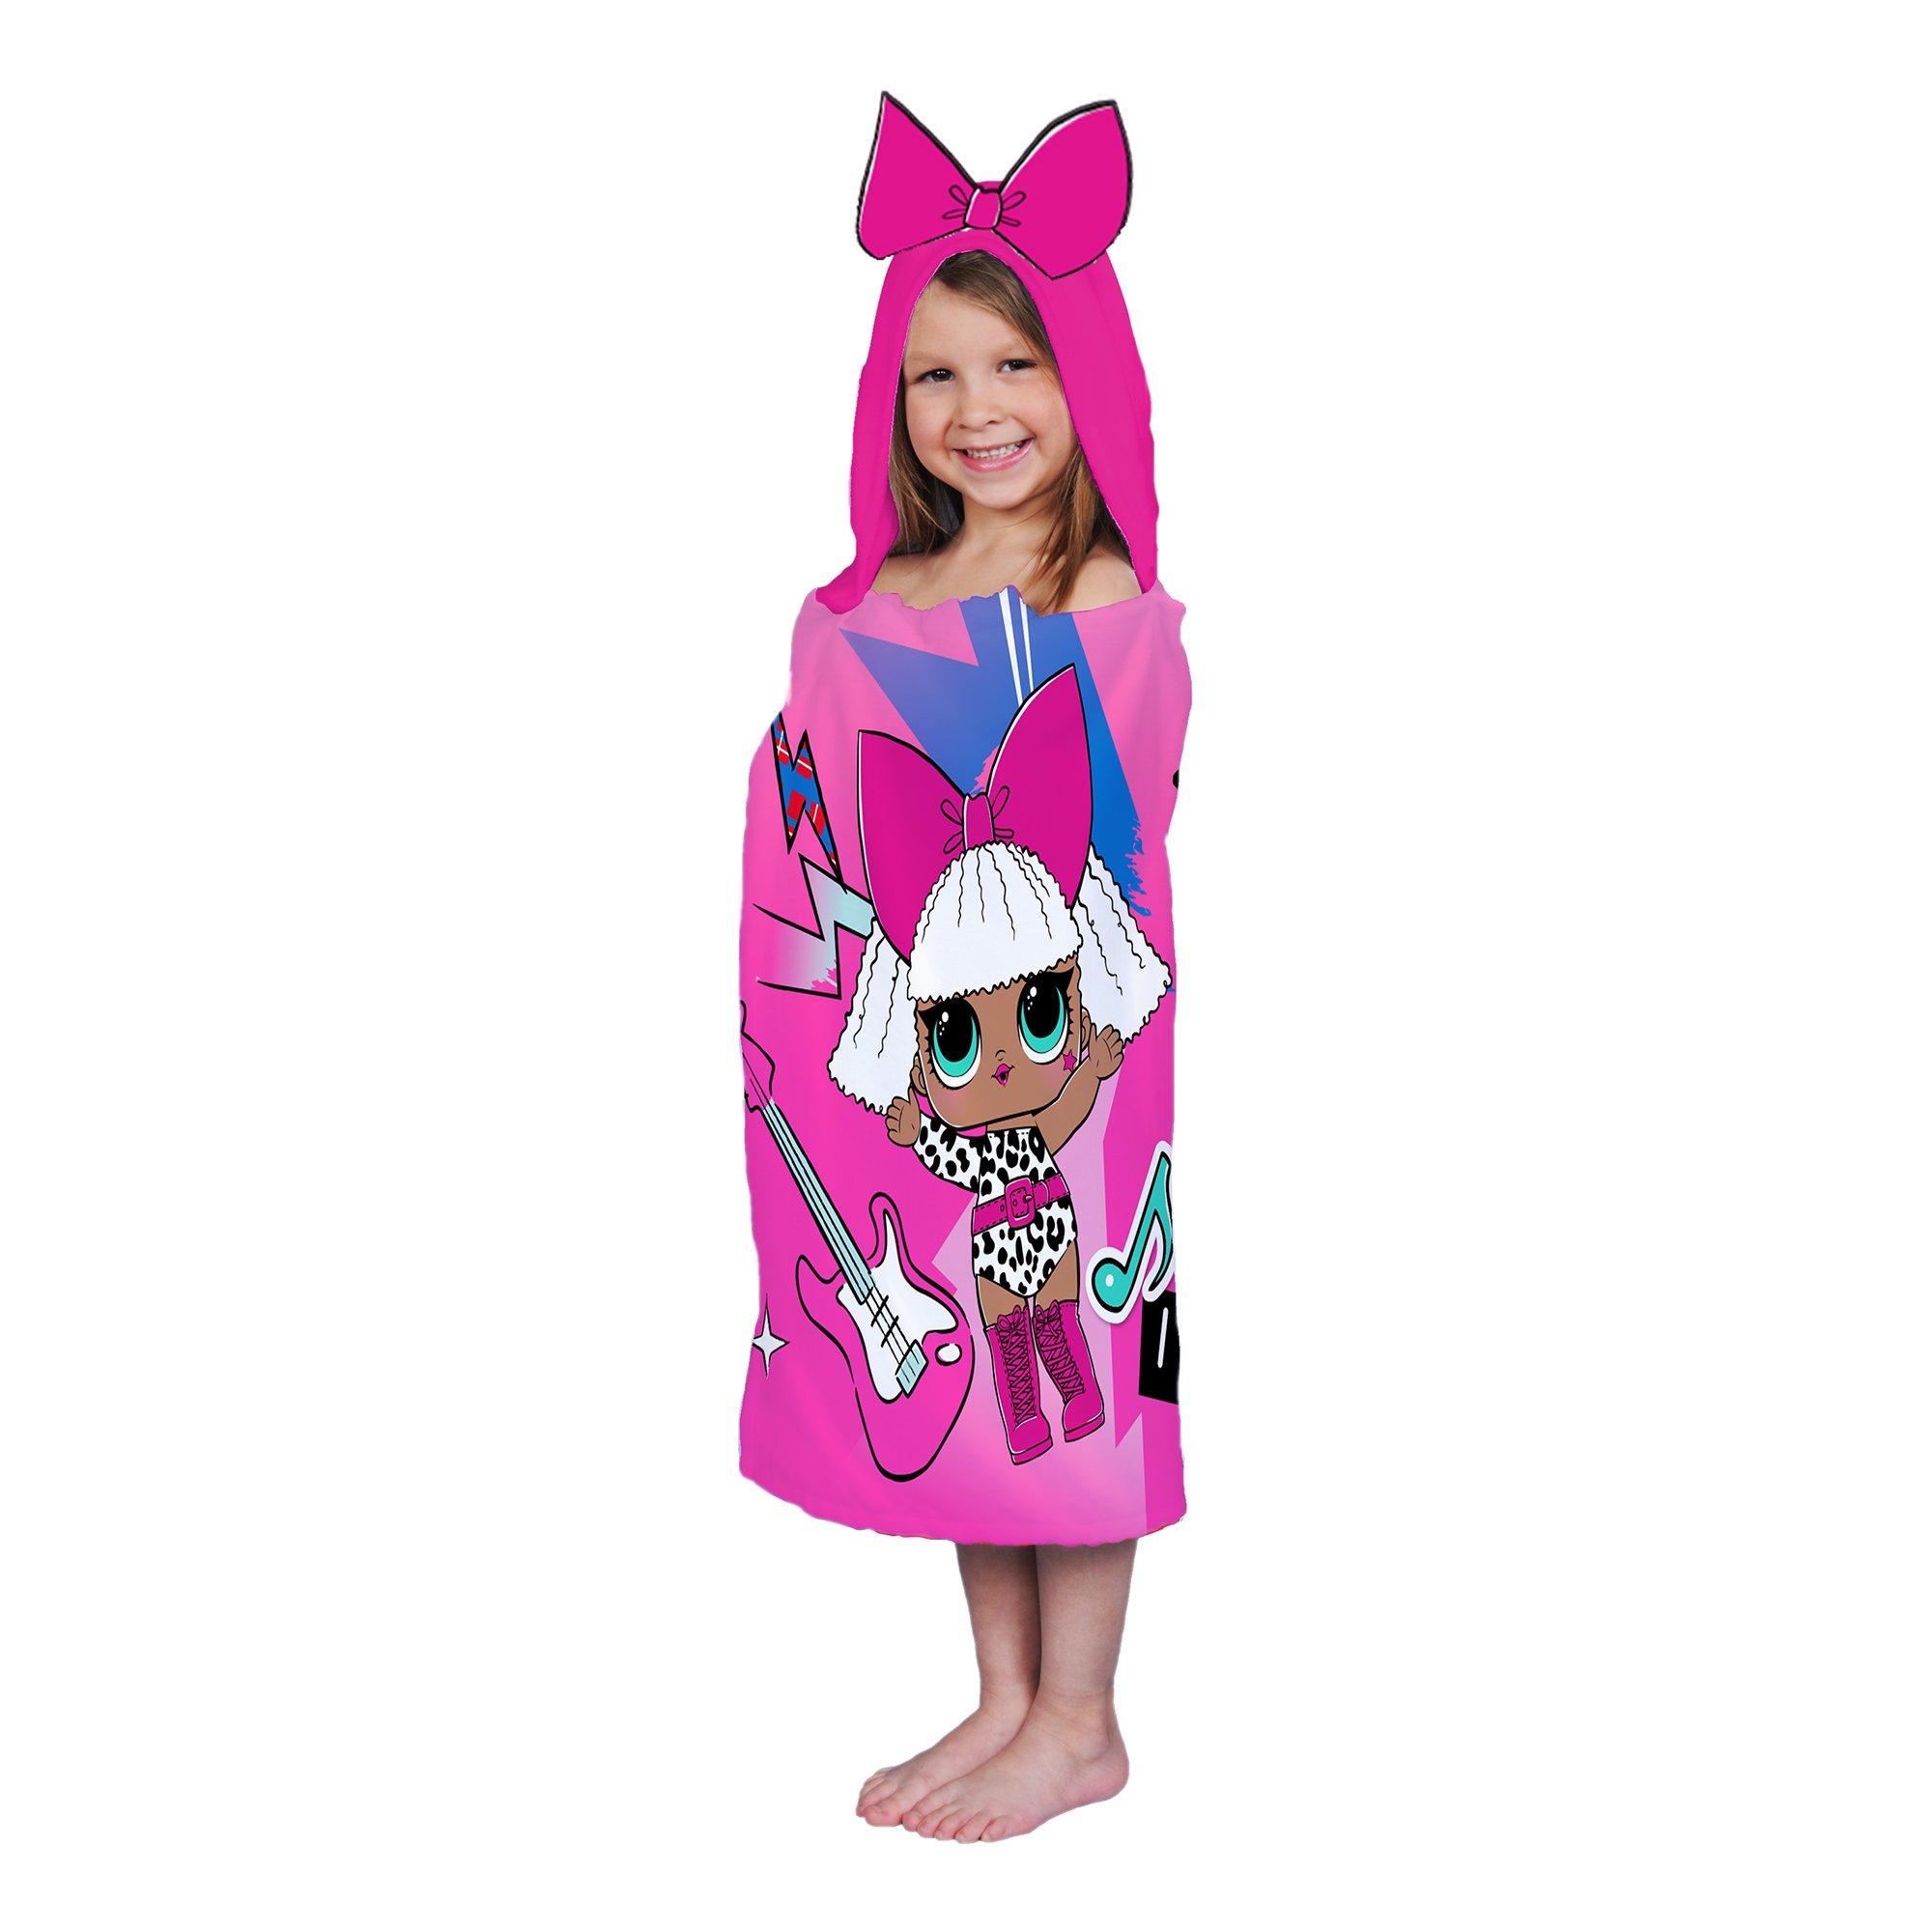 MGA LOL Surprise My Debut Hooded Towel Wrap by MGA